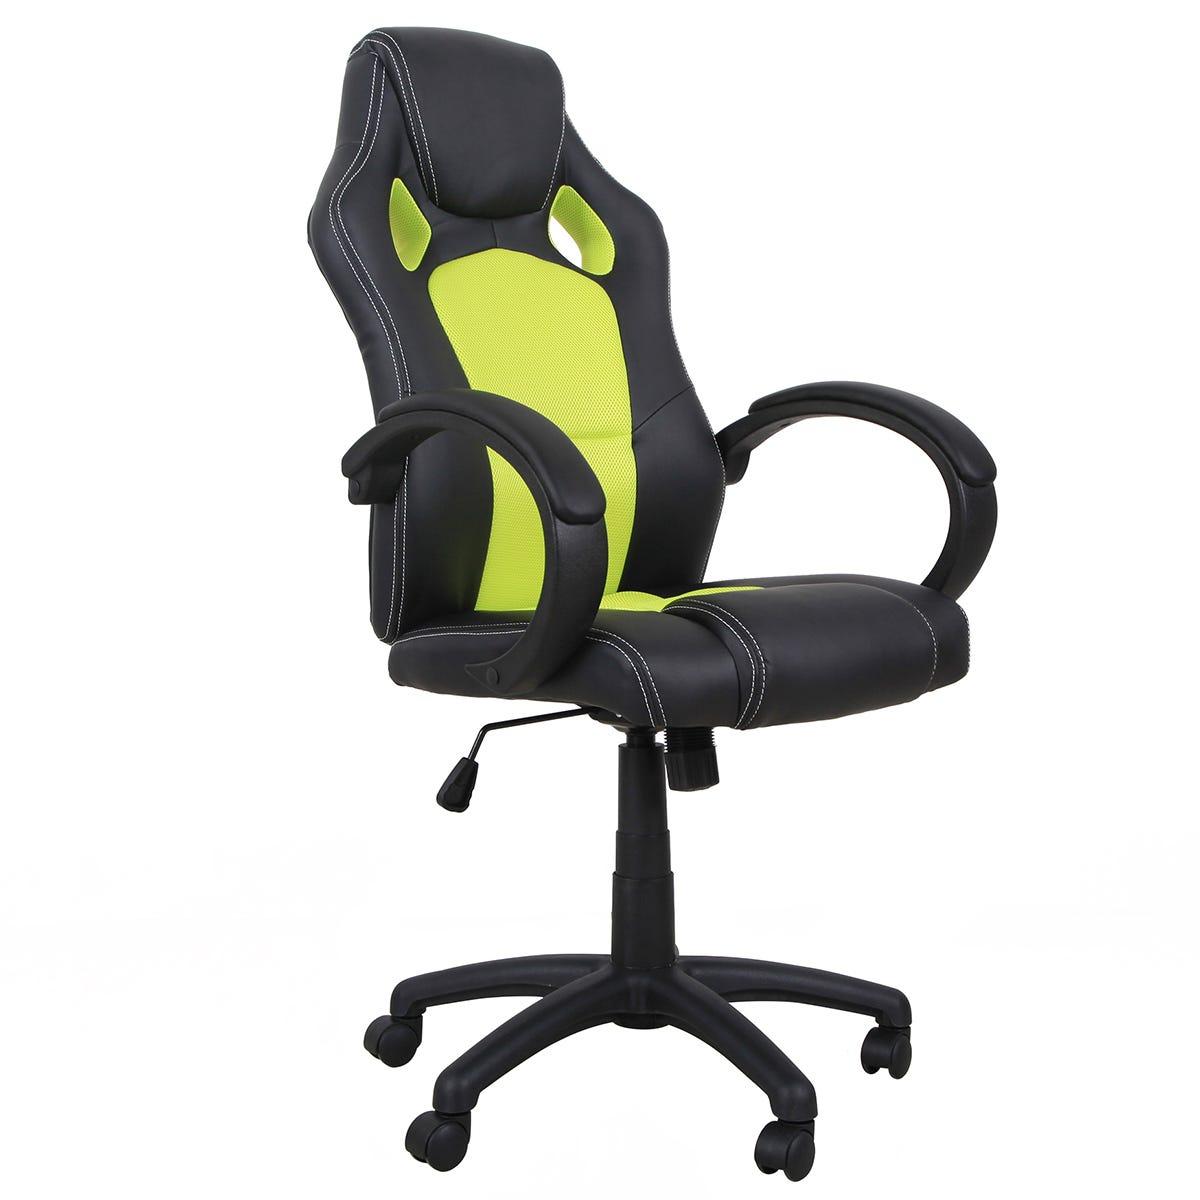 Equinox Bolt PU Leather Gaming Chair - Black/Green